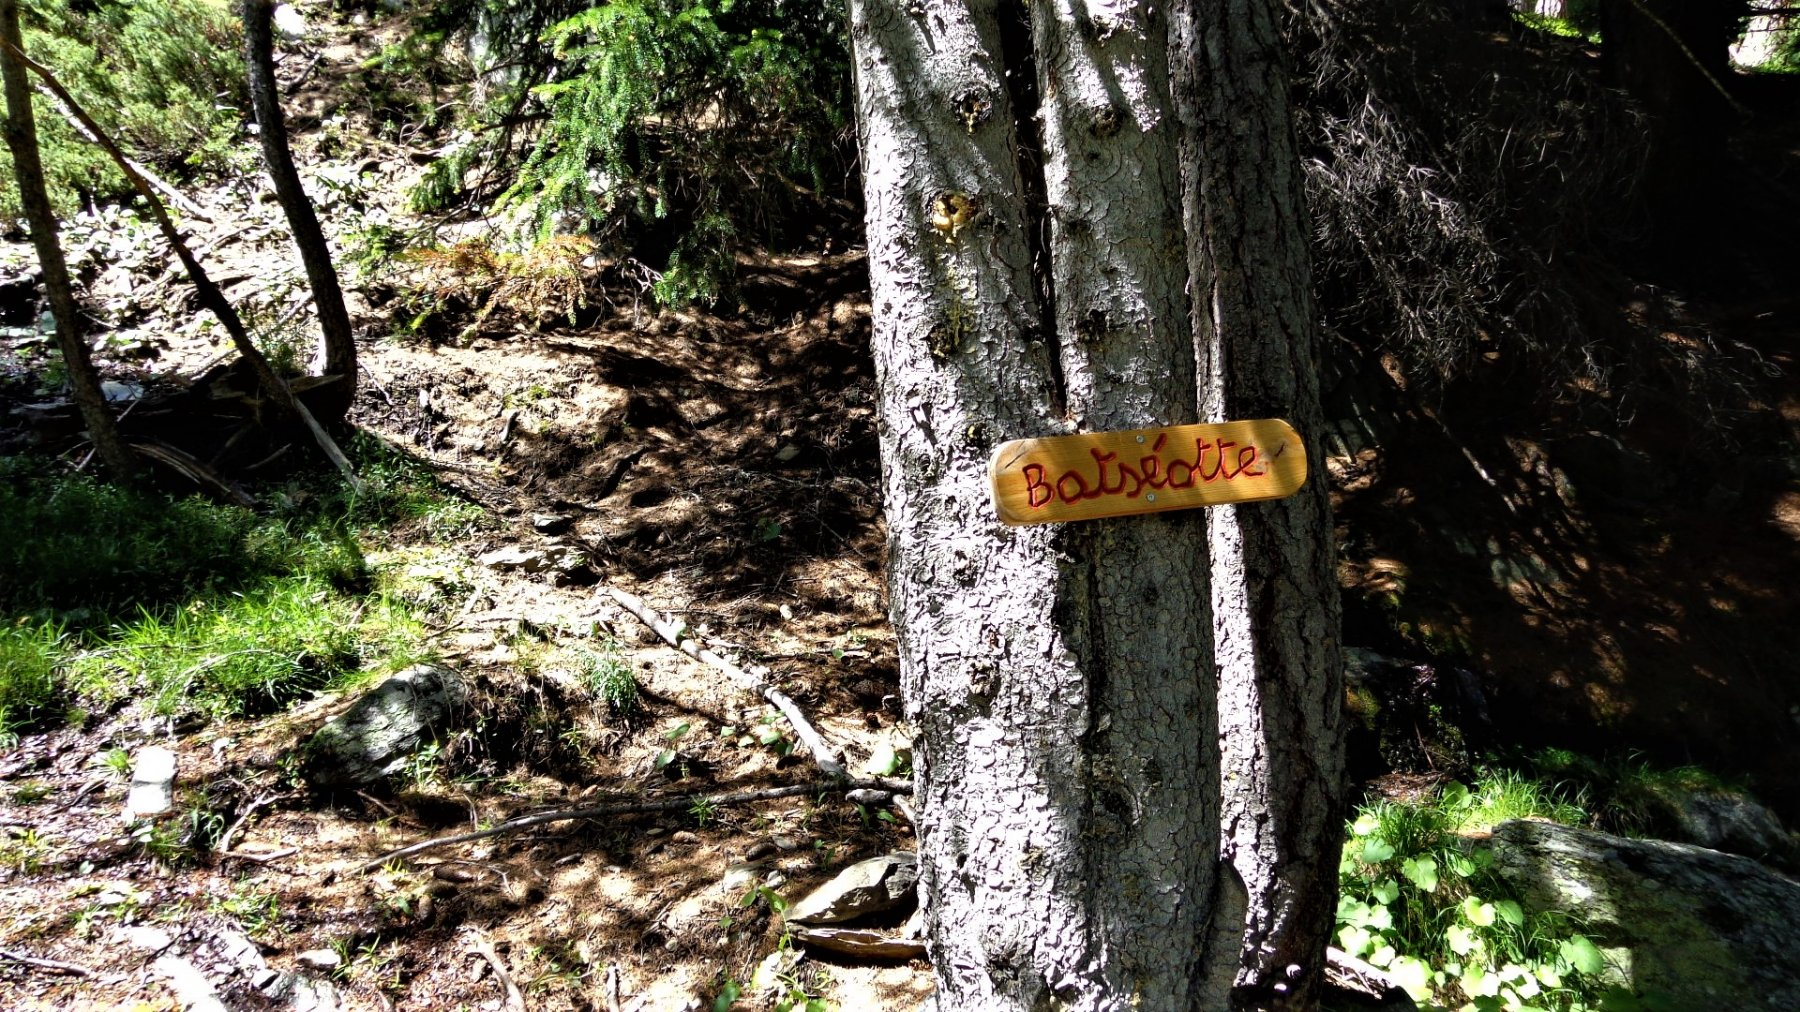 Cartello all'albero a quota 1945m